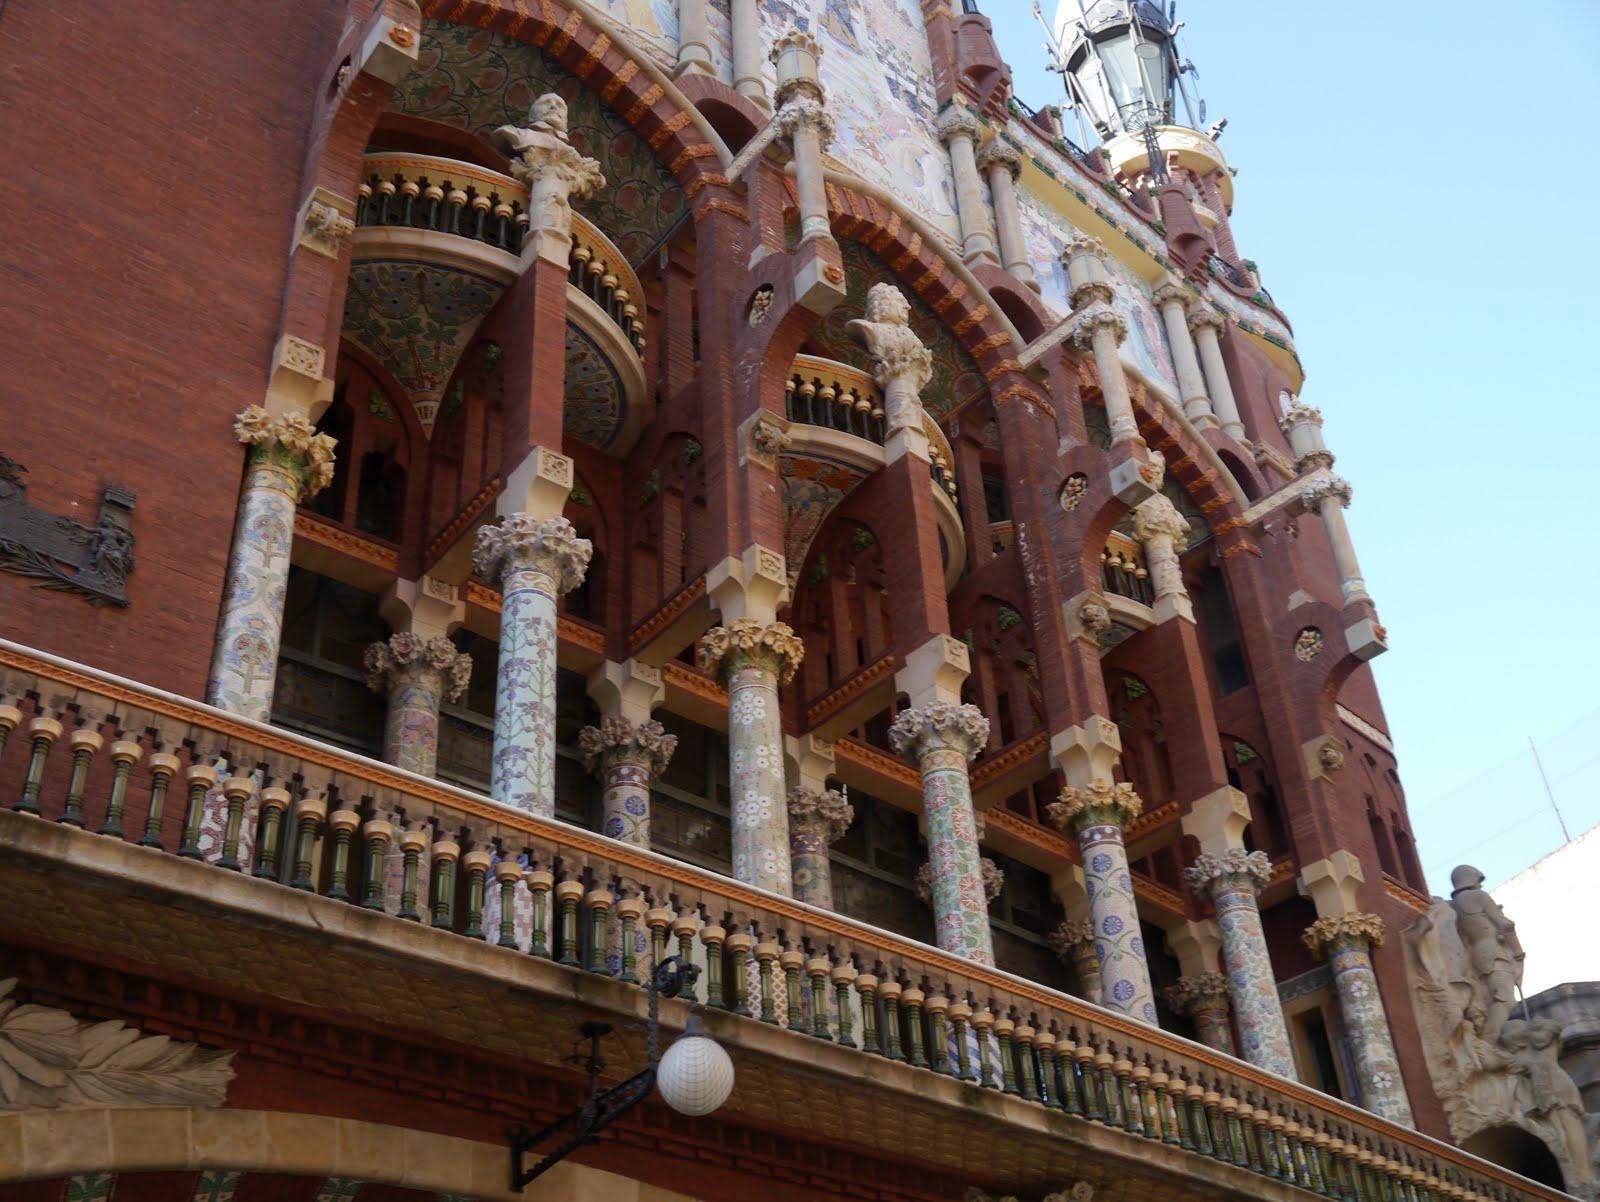 Palau_de_la_Musica_Catalana_дворец_каталонской_музыки_Барселона